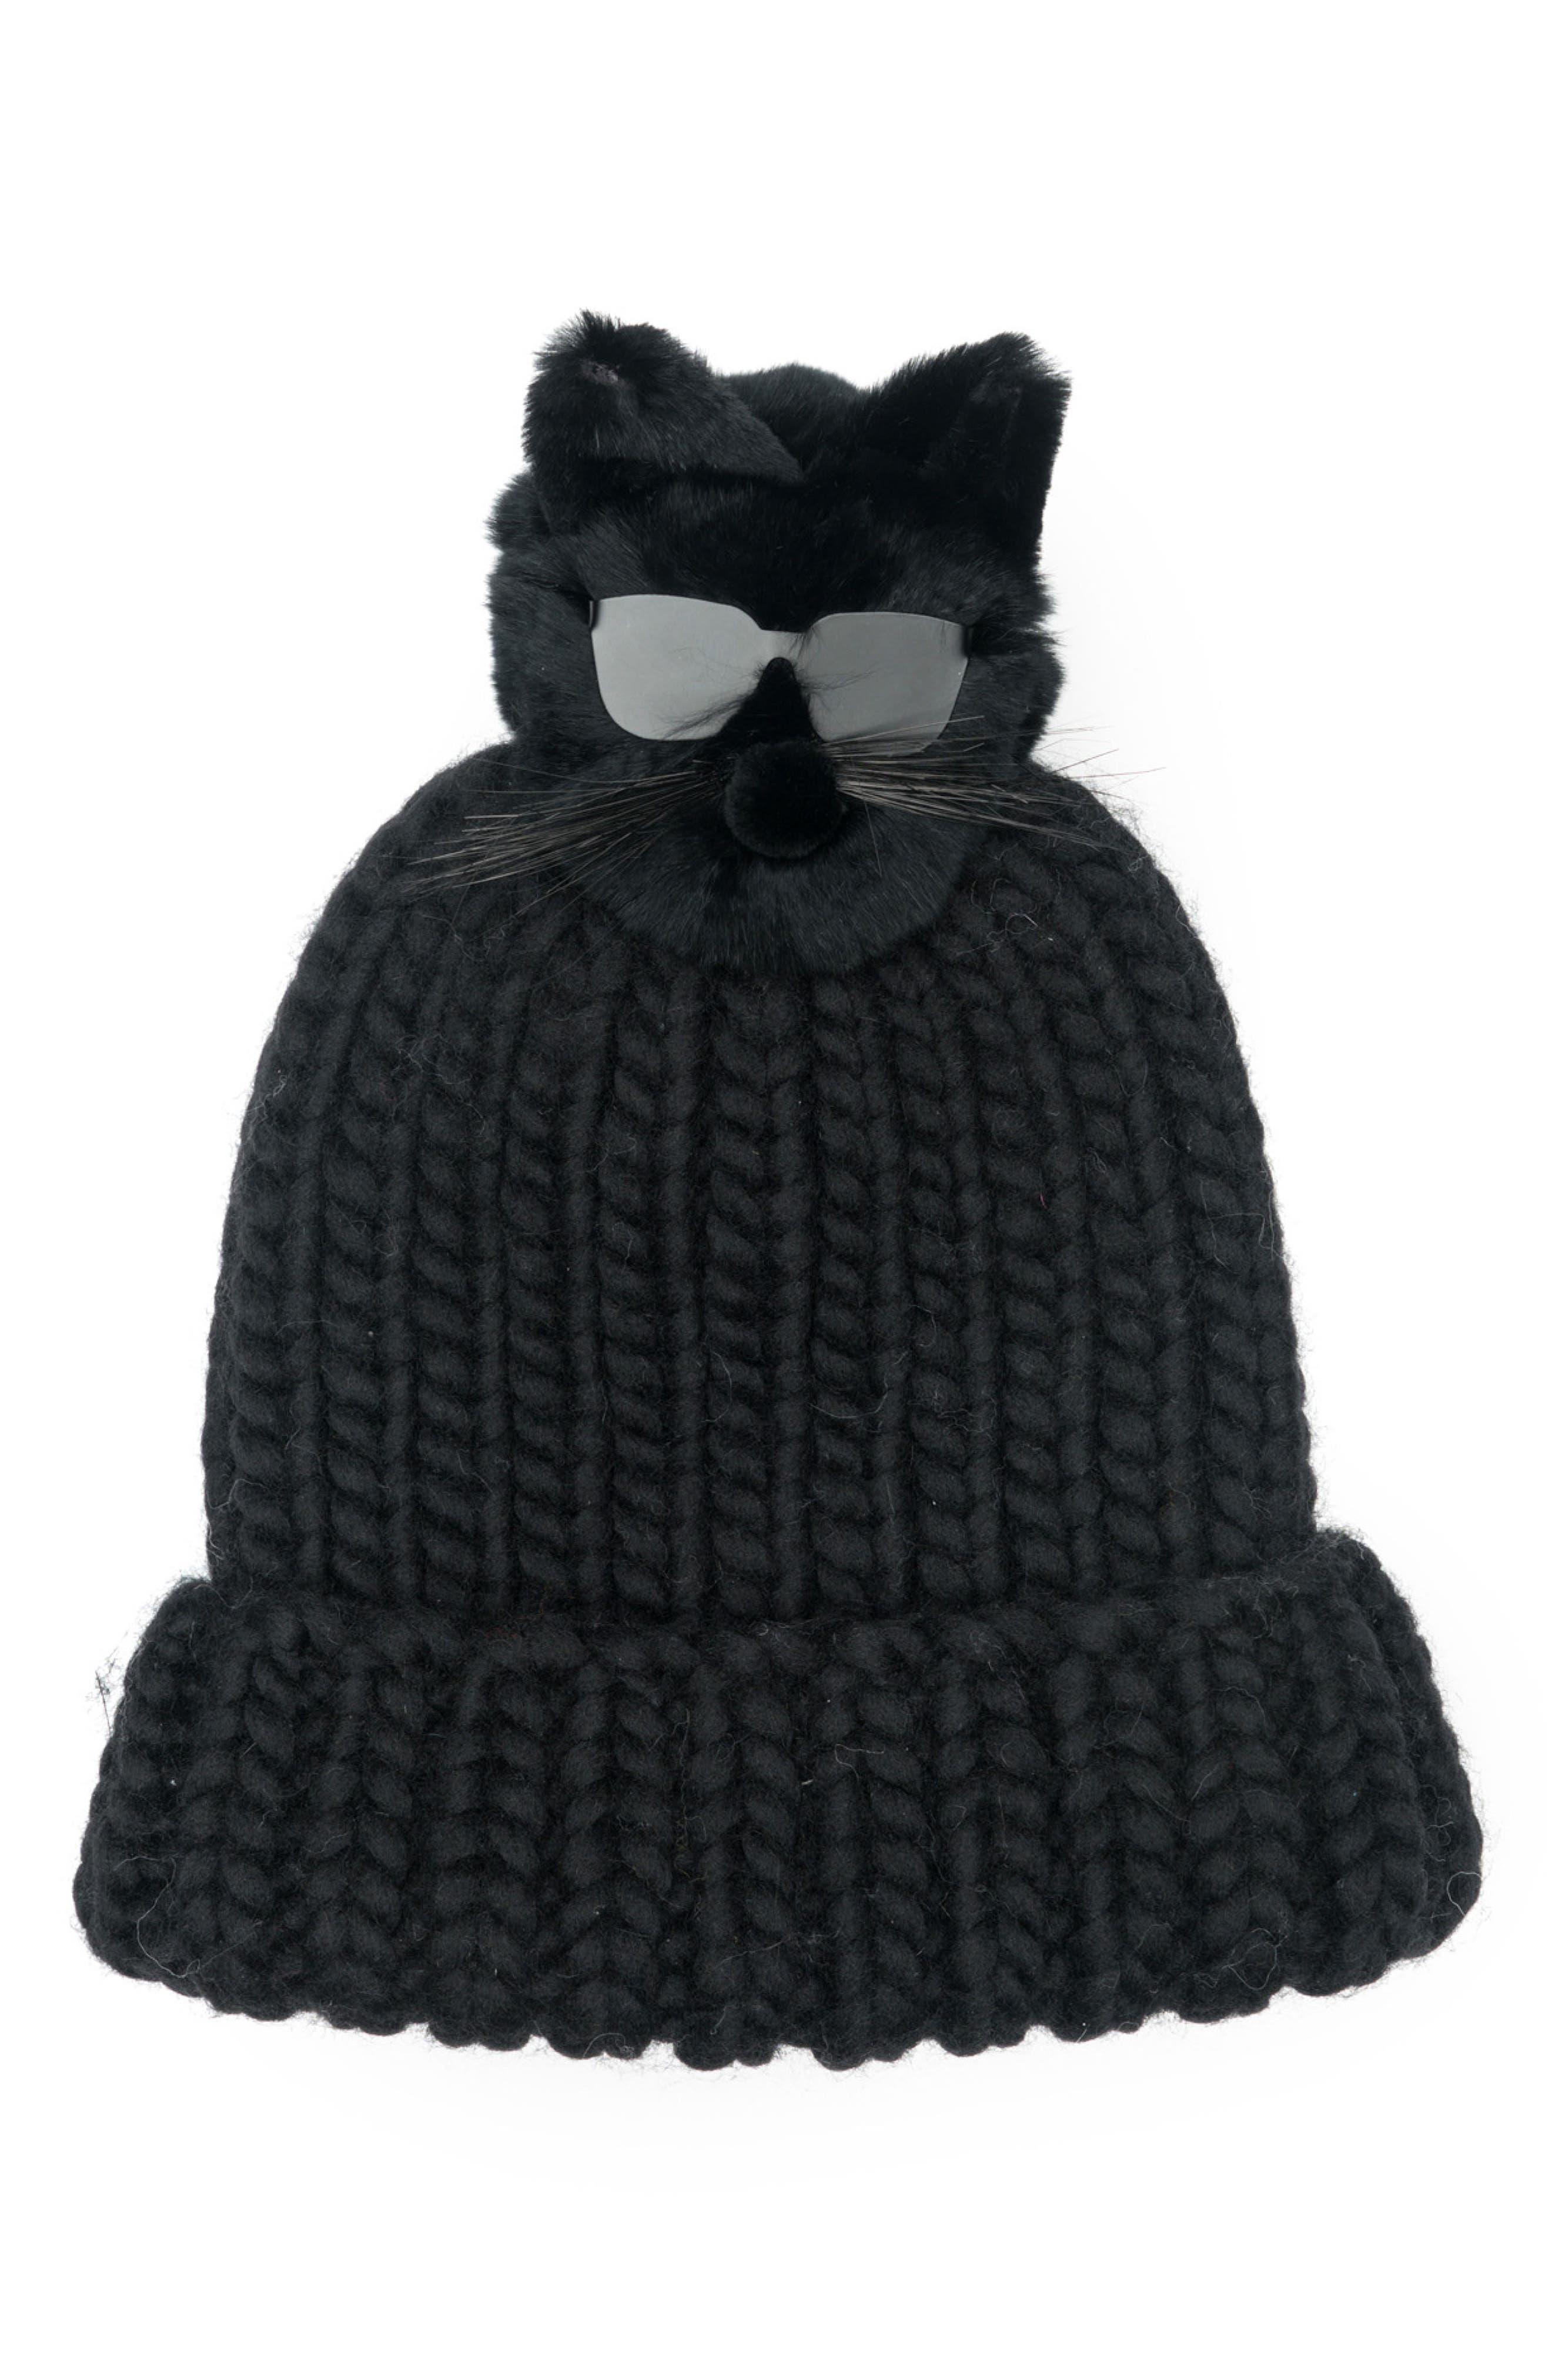 Rain Wool Stocking Cap with Genuine Fox Fur Pom,                             Main thumbnail 1, color,                             001